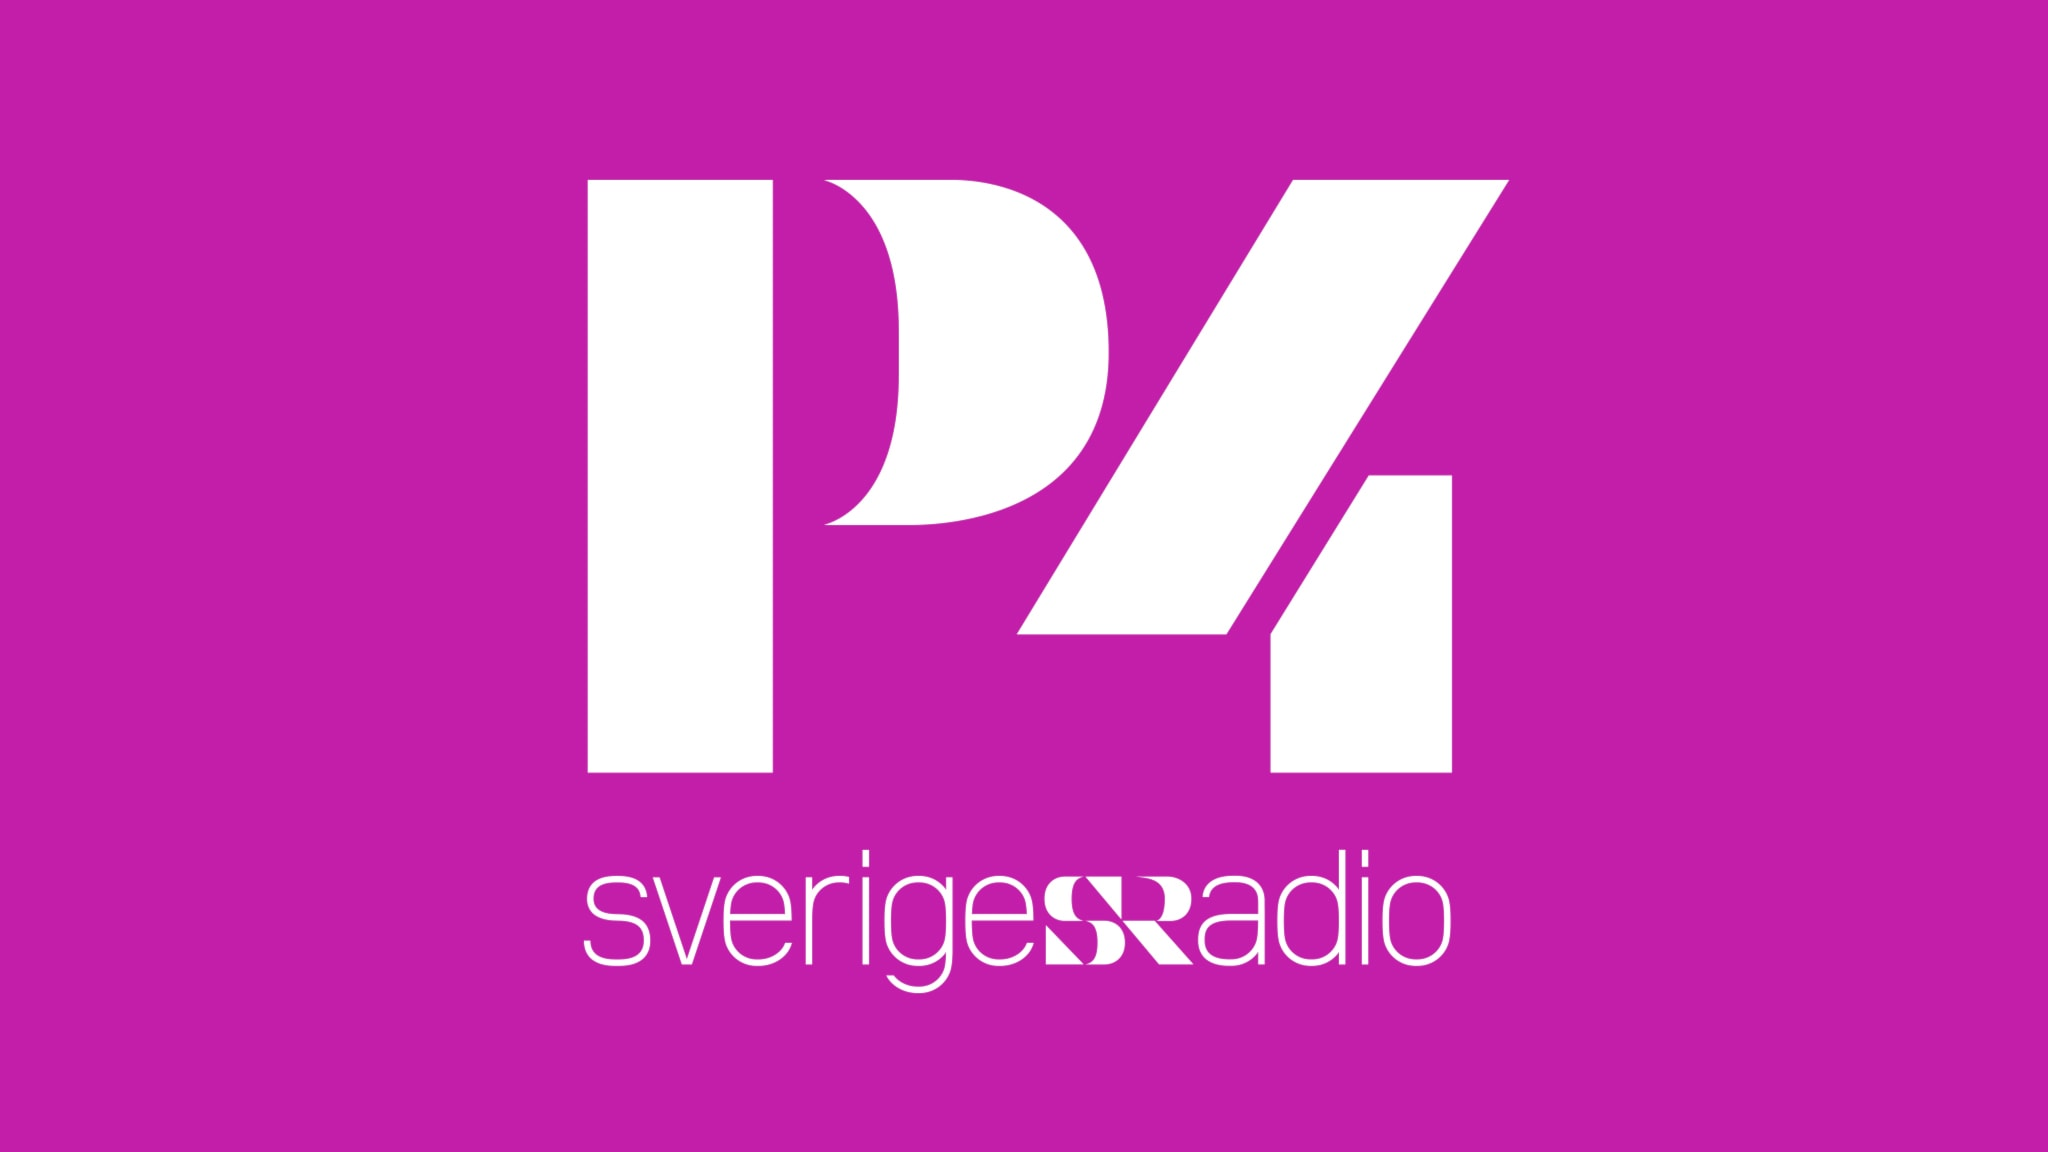 Trafik P4 Stockholm 20180929 04.44 (00.28)